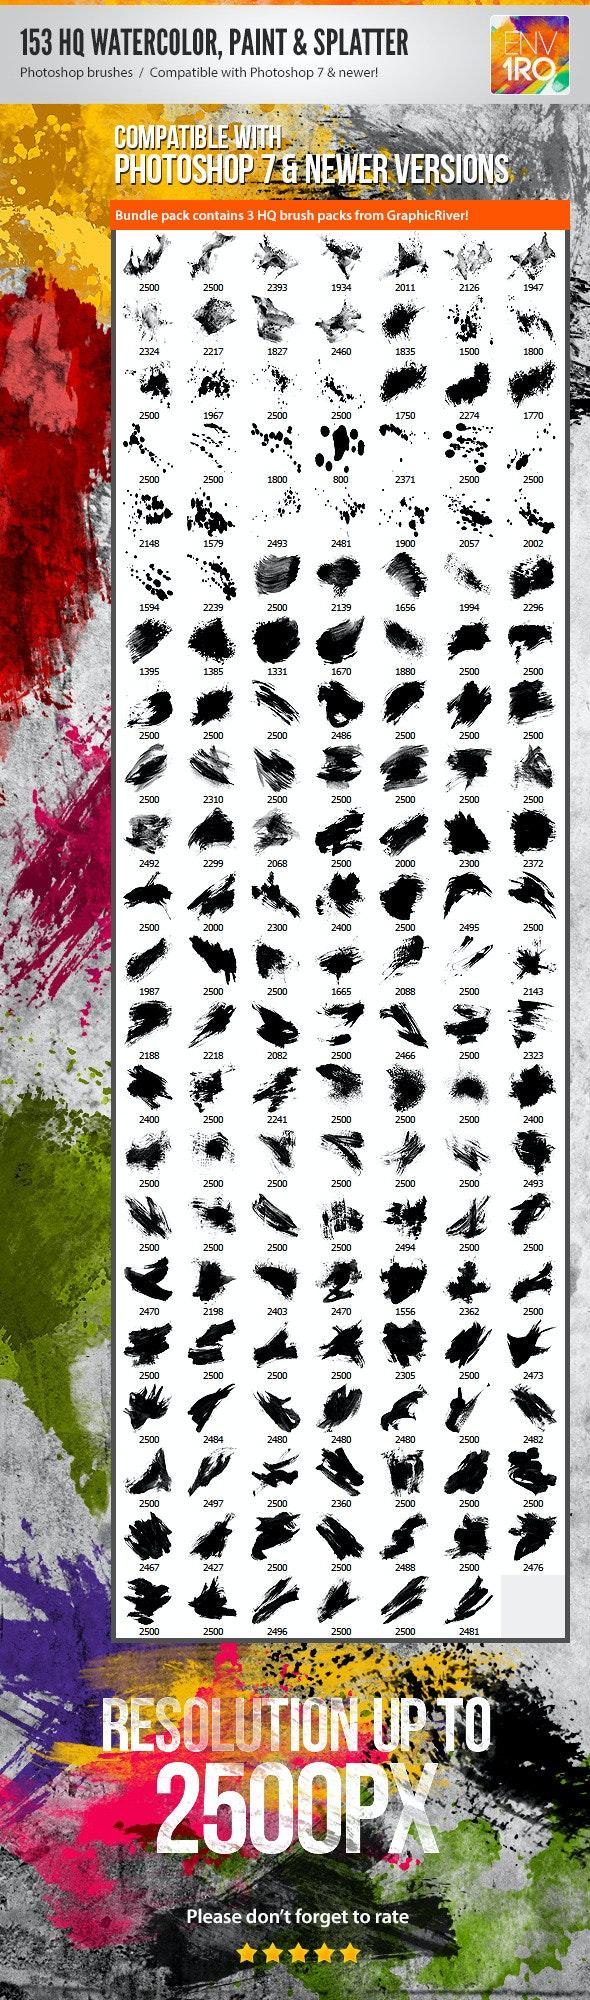 153 Watercolor Paint & Splatter Photoshop Brushes - Artistic Brushes